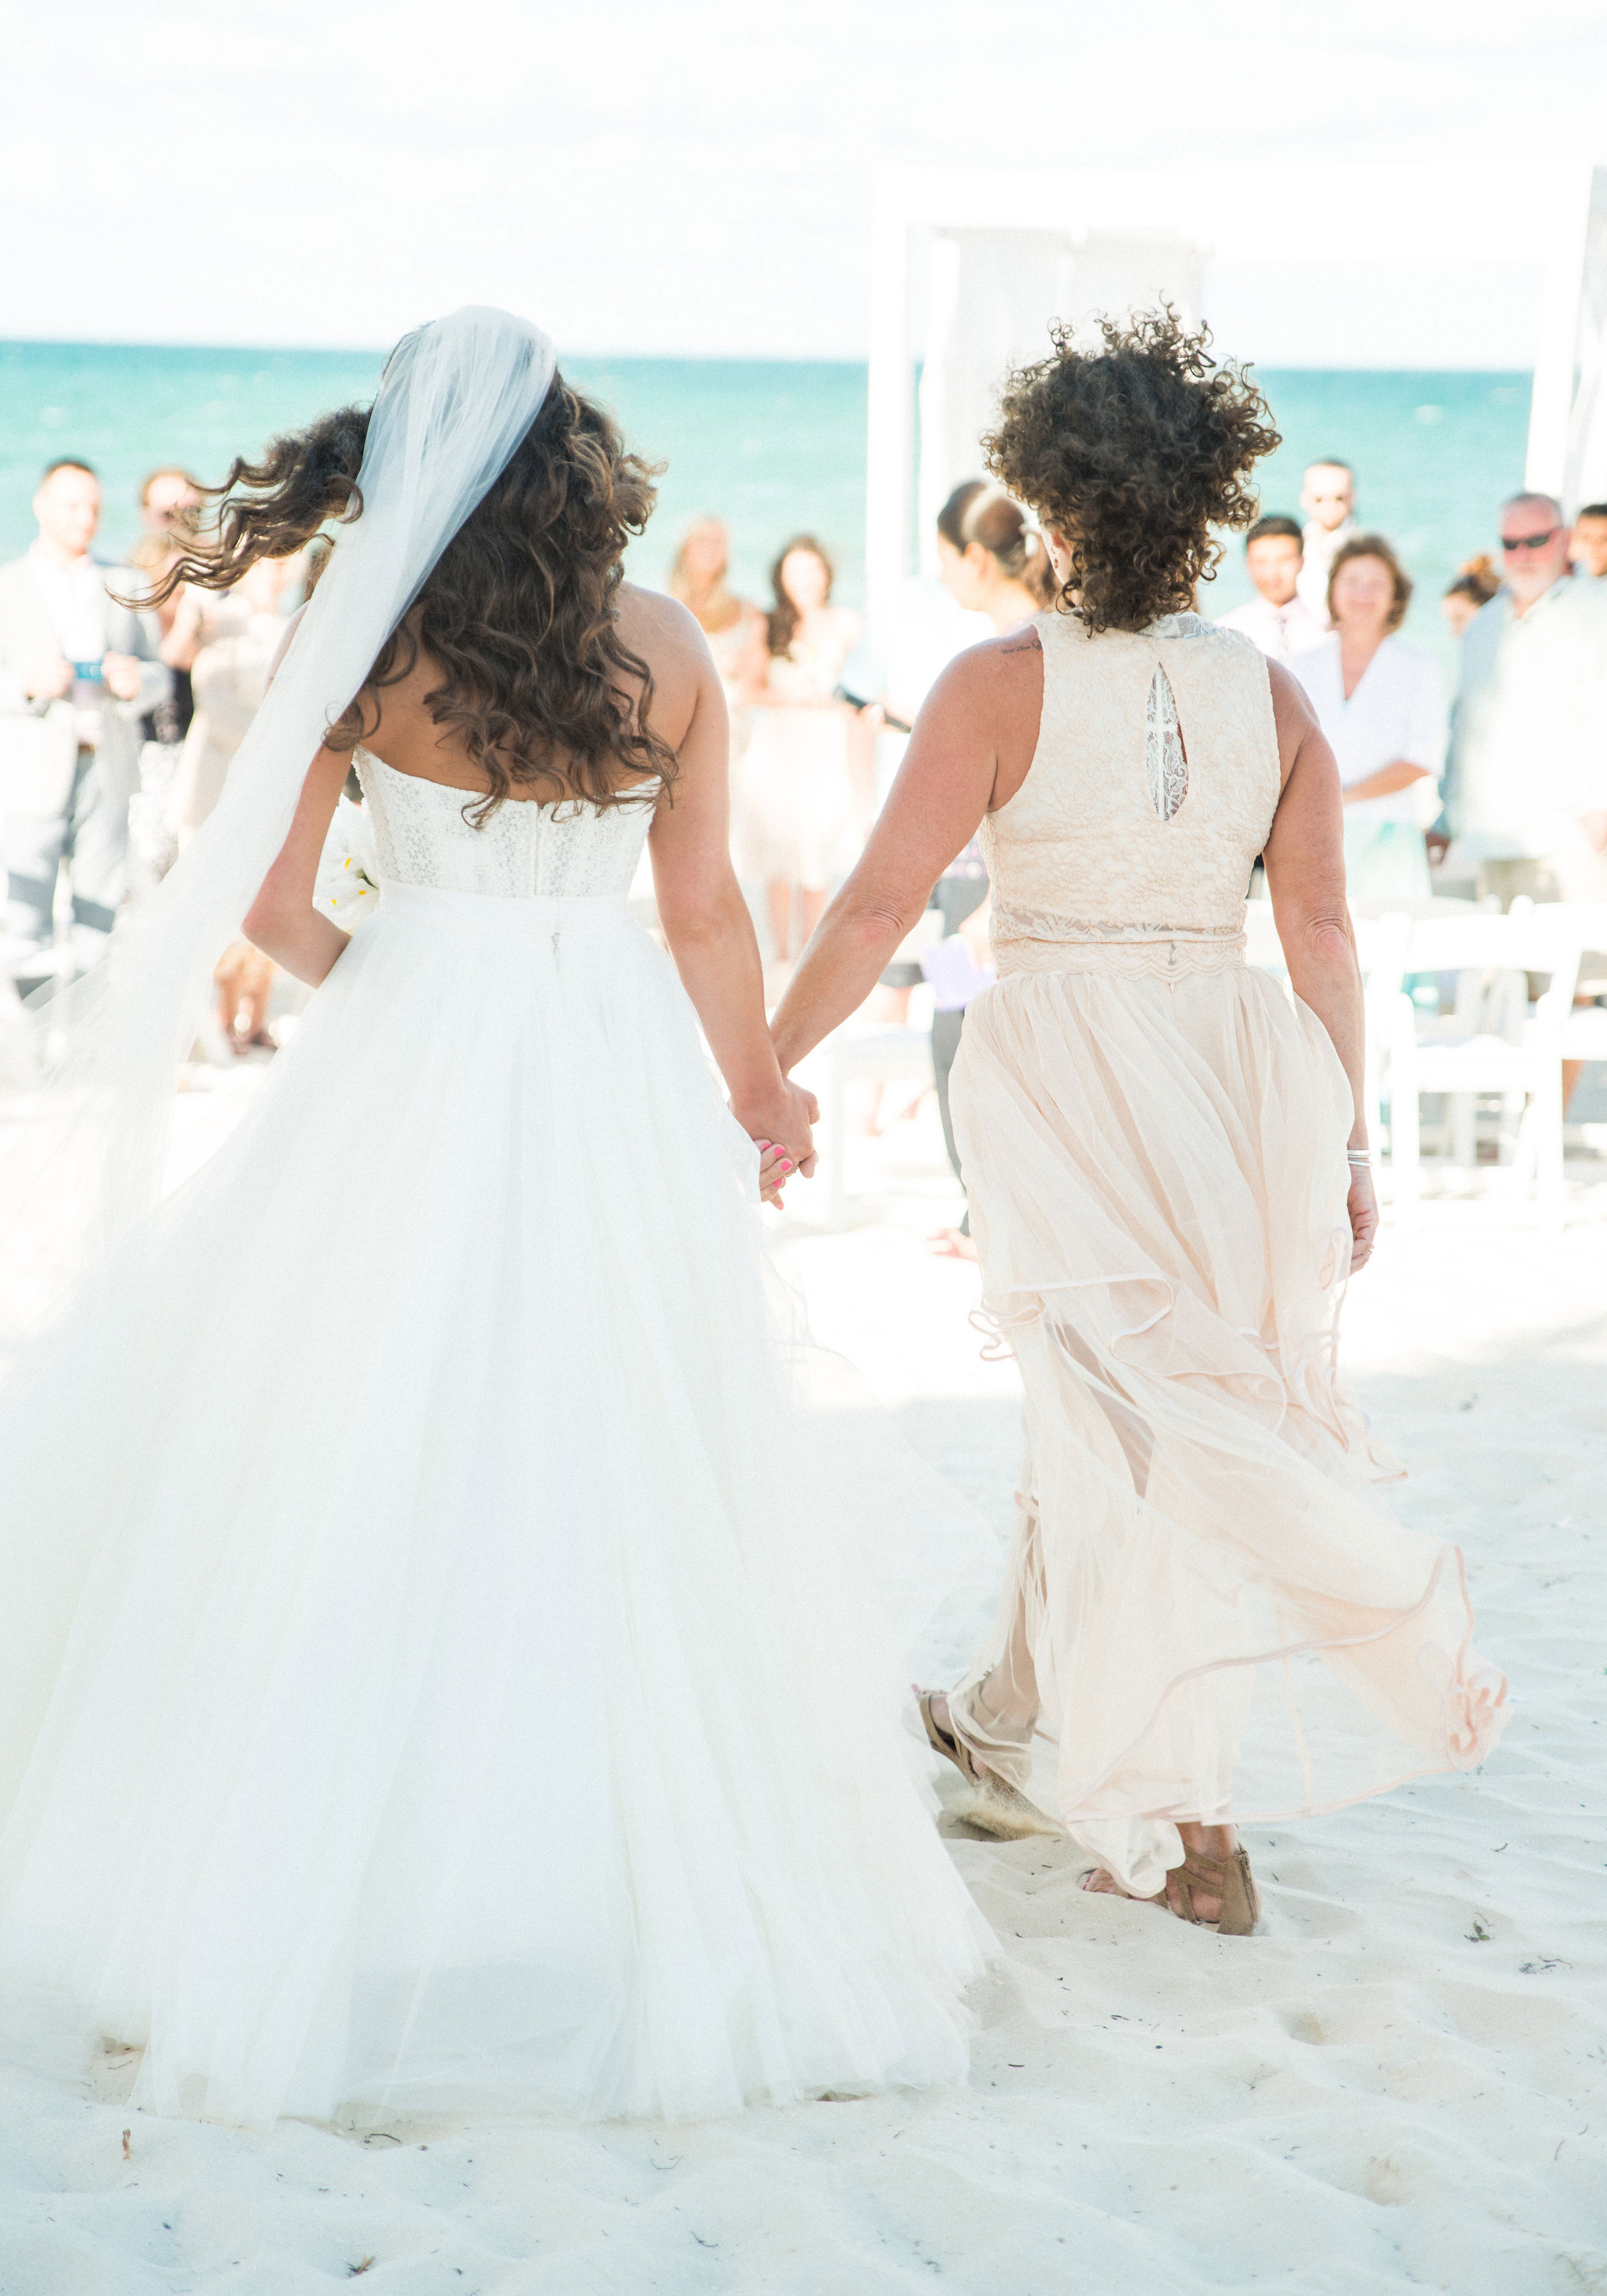 Beach wedding, Mom walking bride down the aisle, Bridal separates, Watters Ashan skirt.